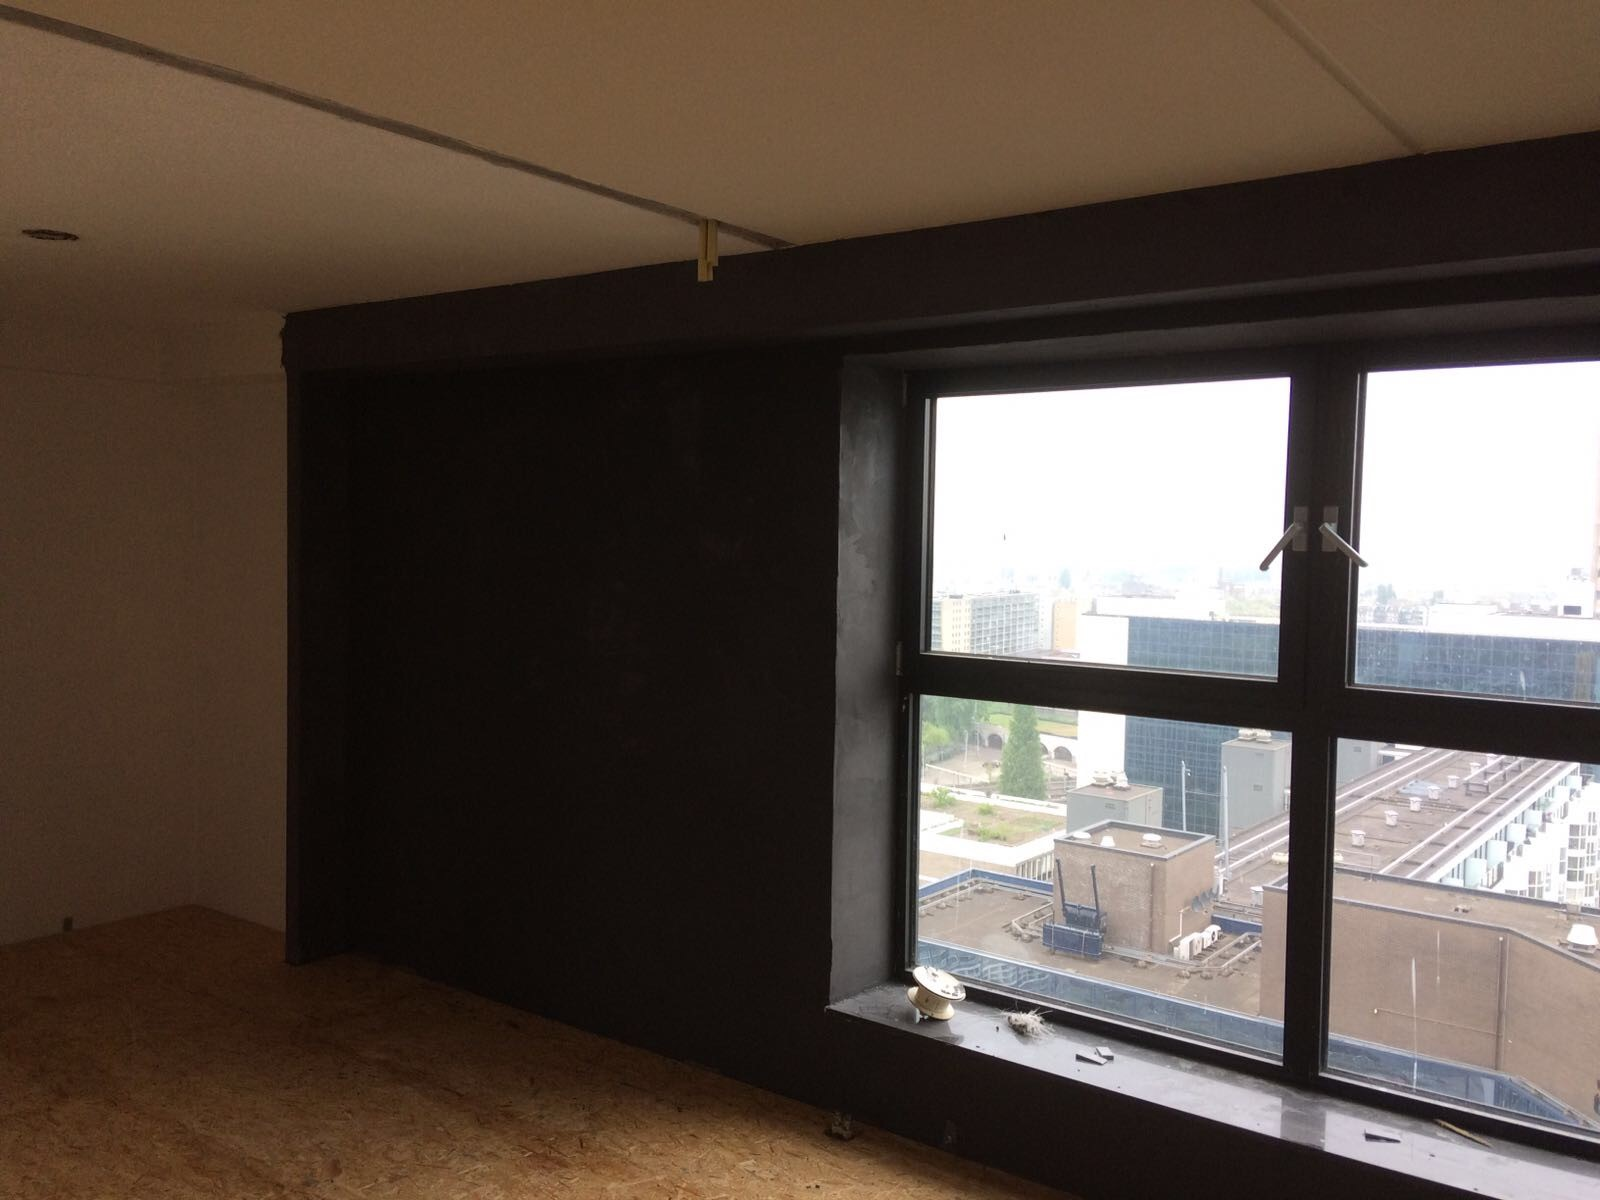 Leef beton rotterdam betonlook wanden en vloer in penthouse - Betonlook wand ...